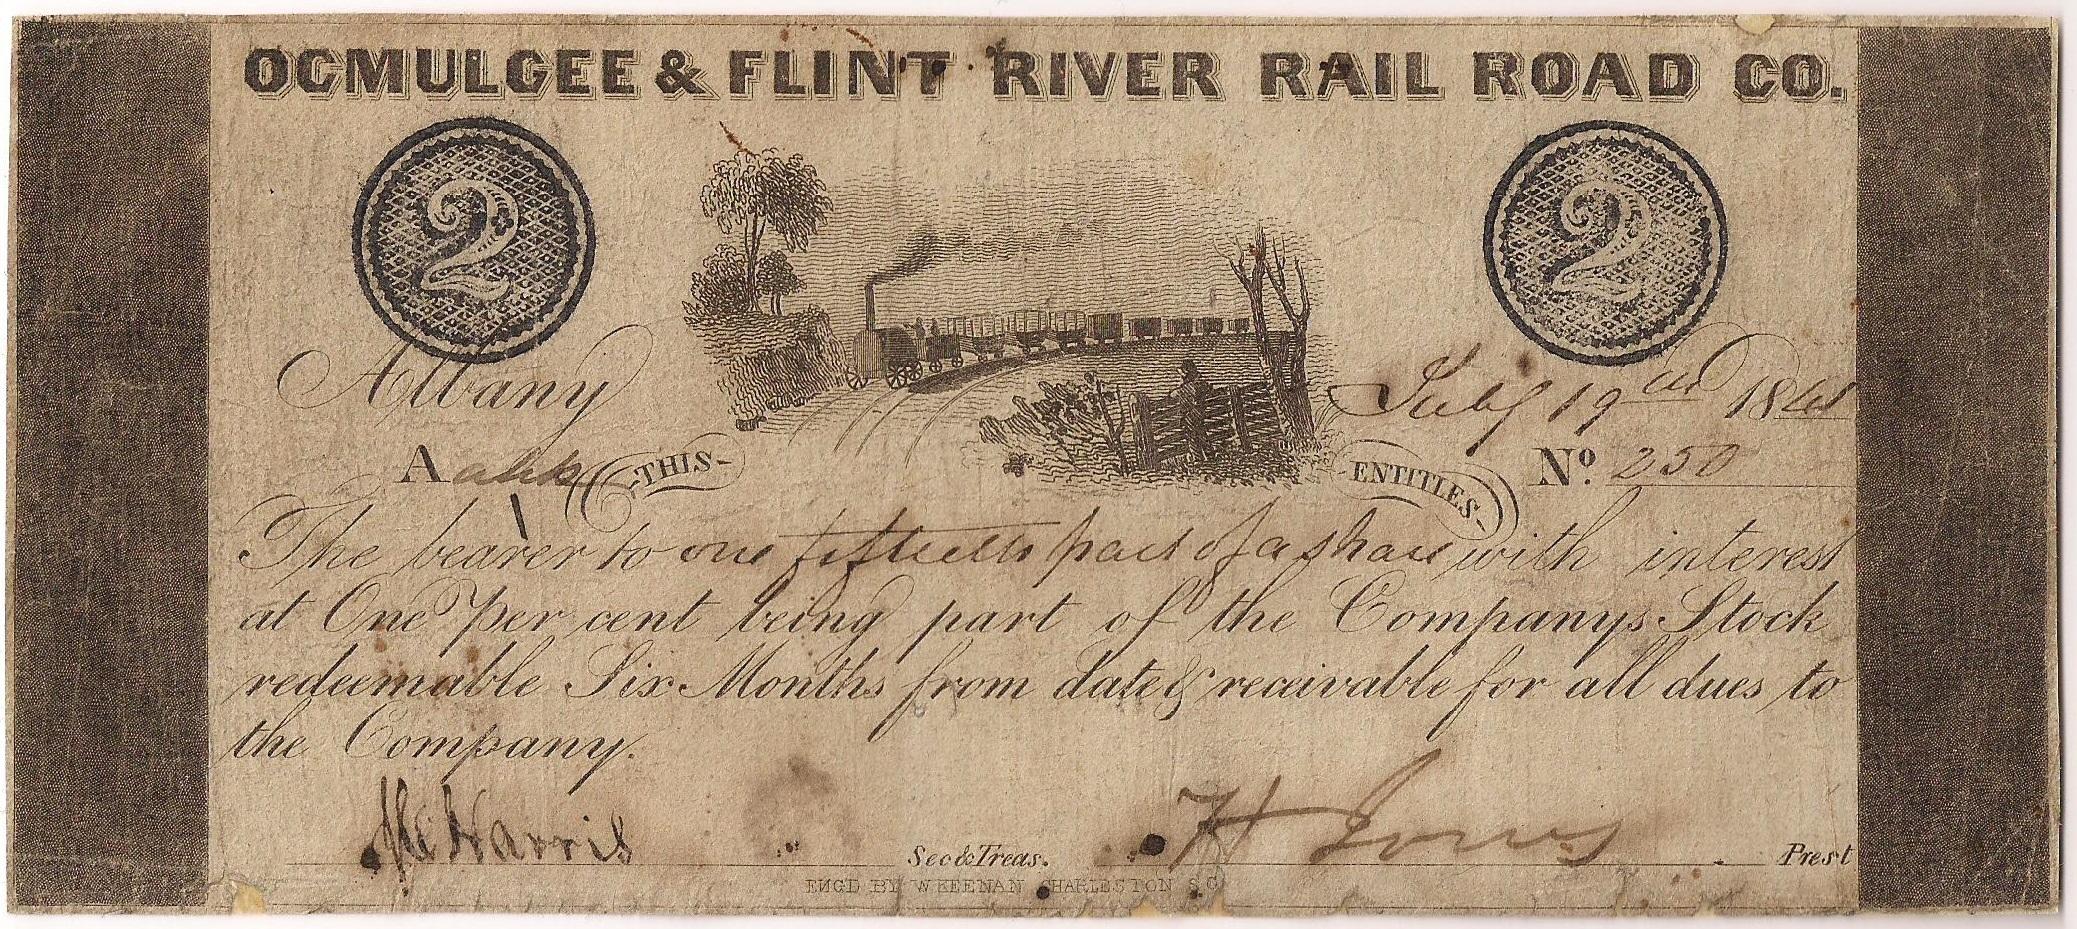 Ocmulgee & Flint River Rail Road Company -